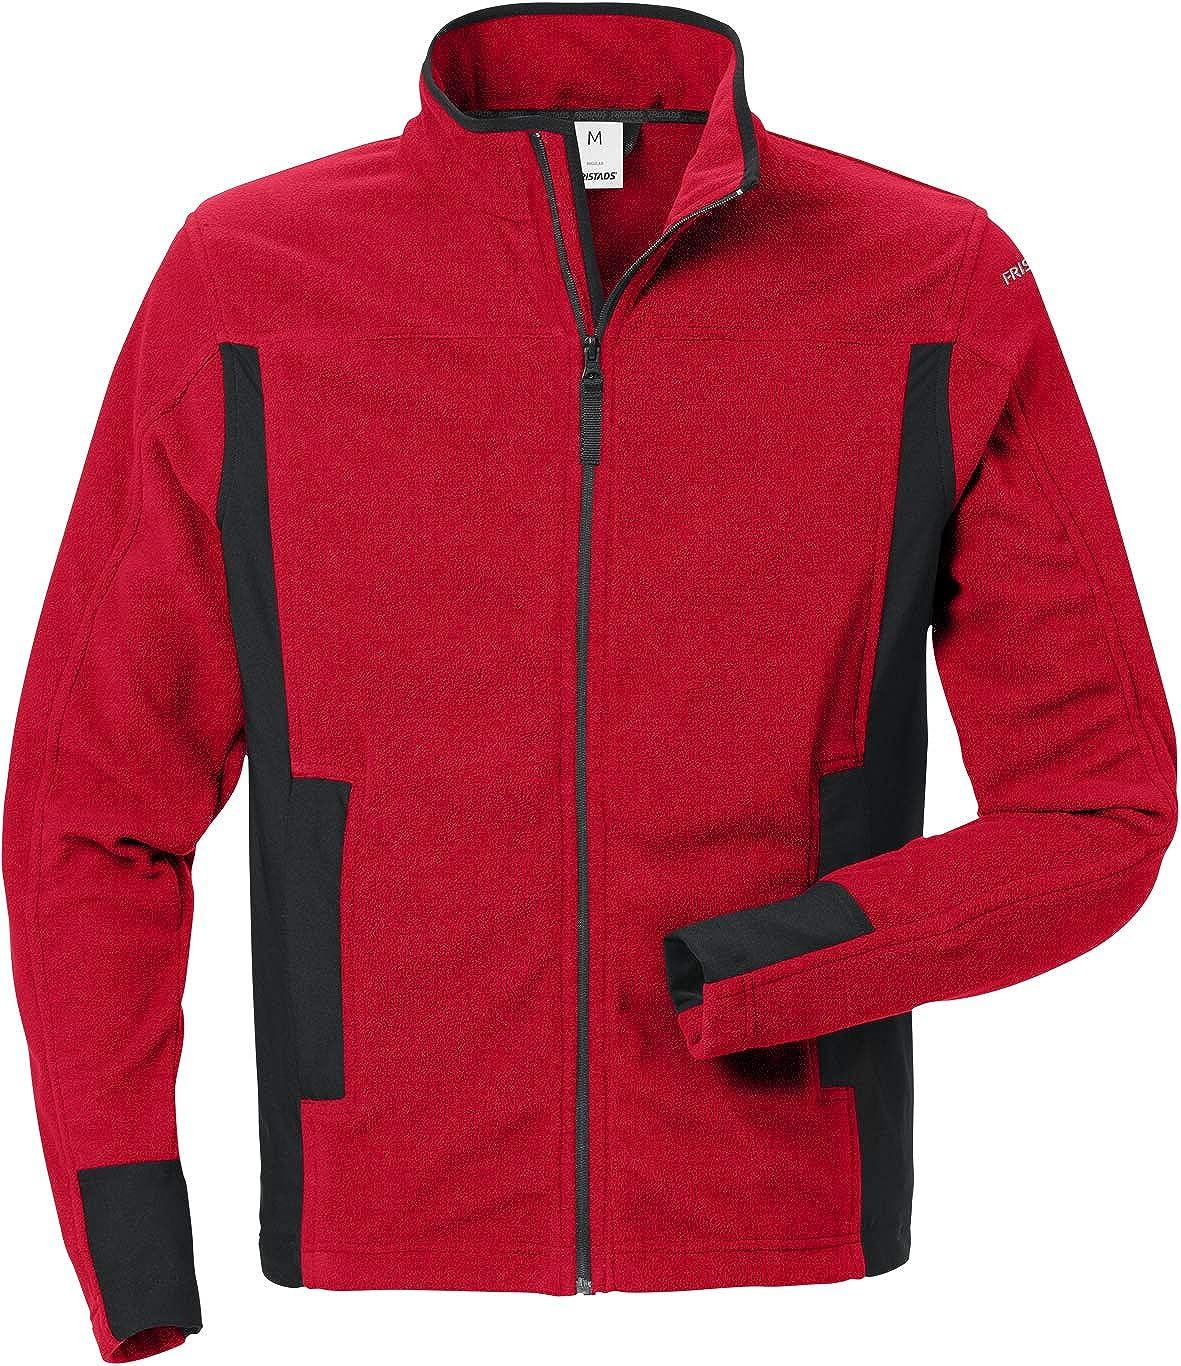 Fristads Workwear 120966 Mens Micro Fleece Jacket Red-Black S